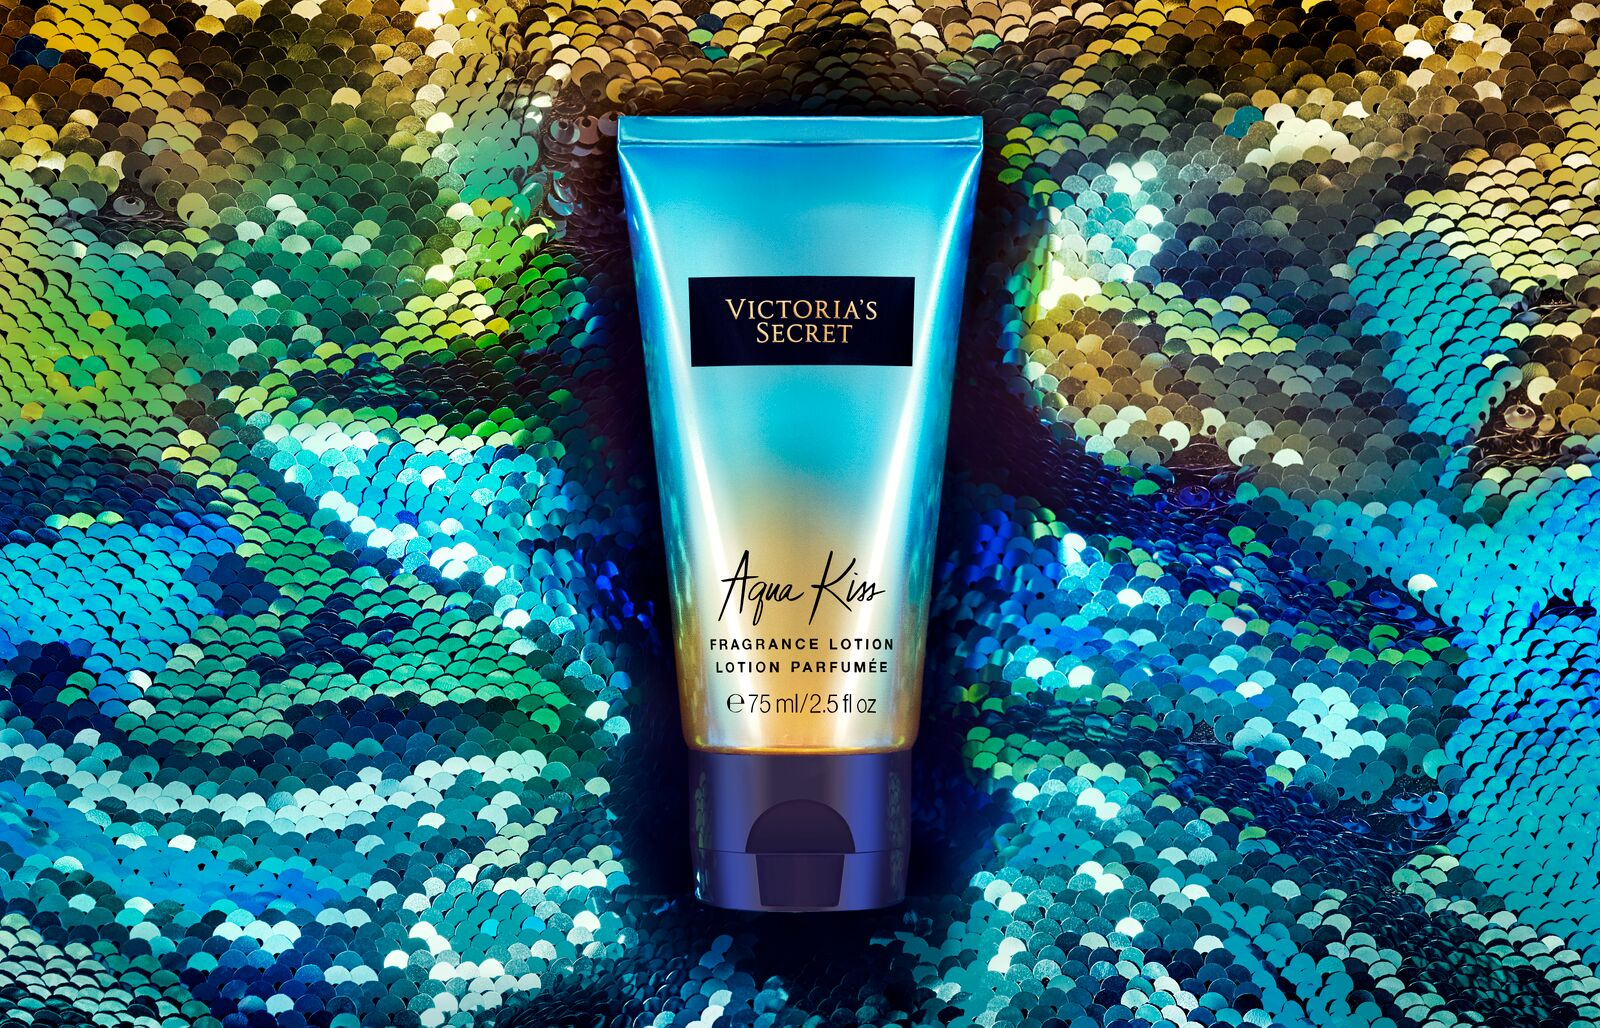 Victoria's Secret Aqua Fragrance Kiss Lotion Product Photography